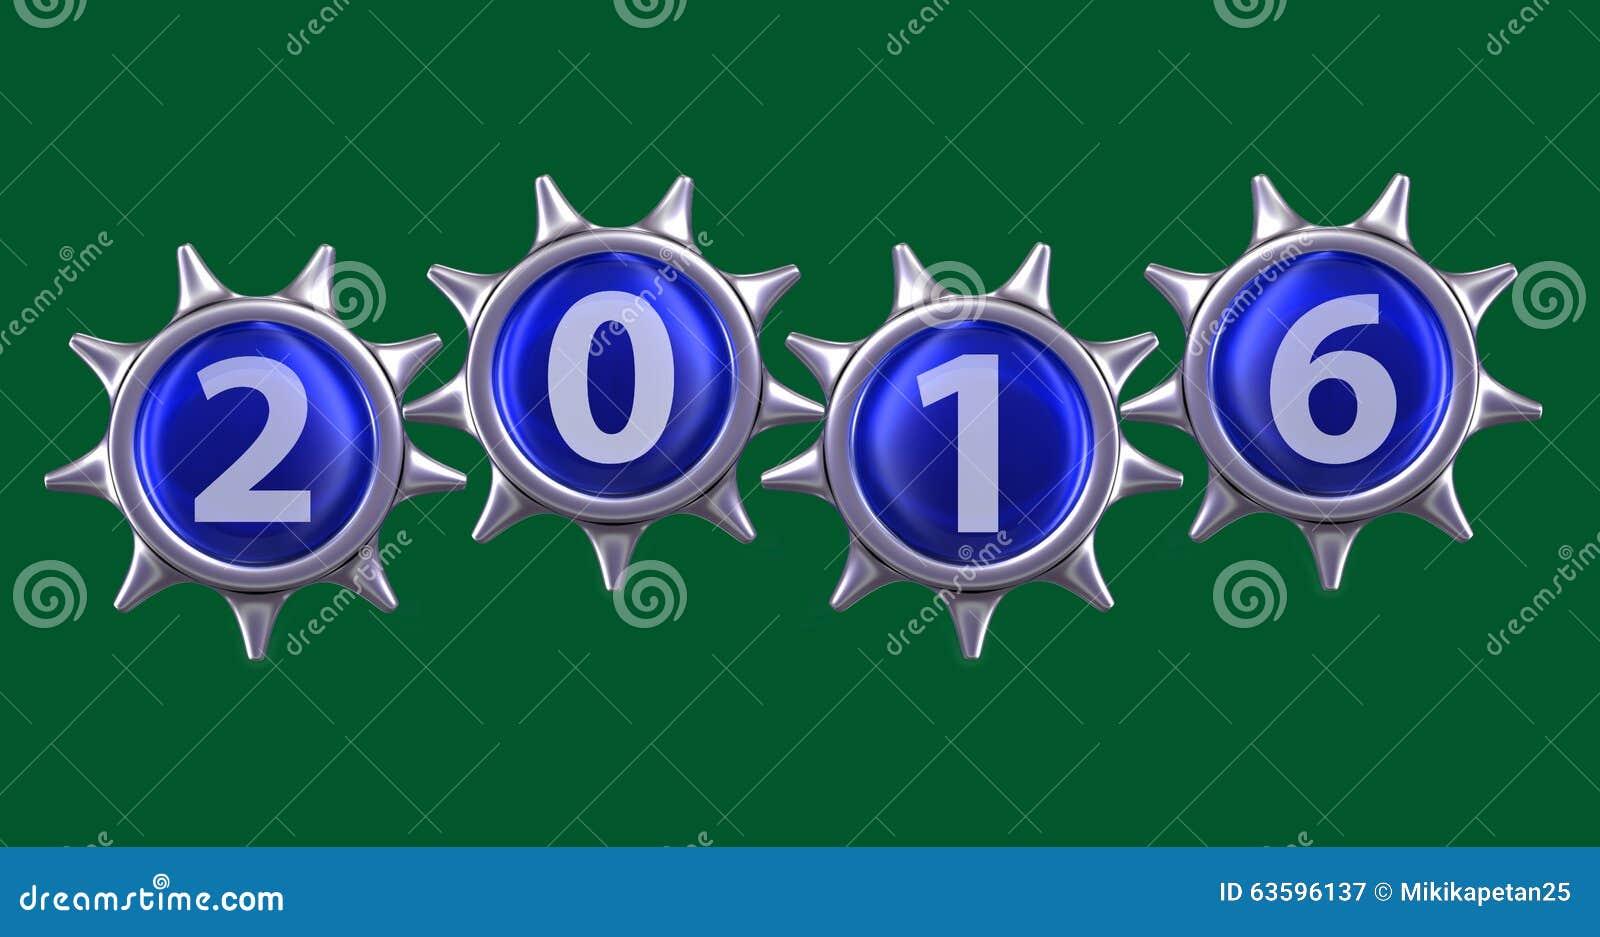 2016 Happy New Year Stock Illustration - Image: 63596137